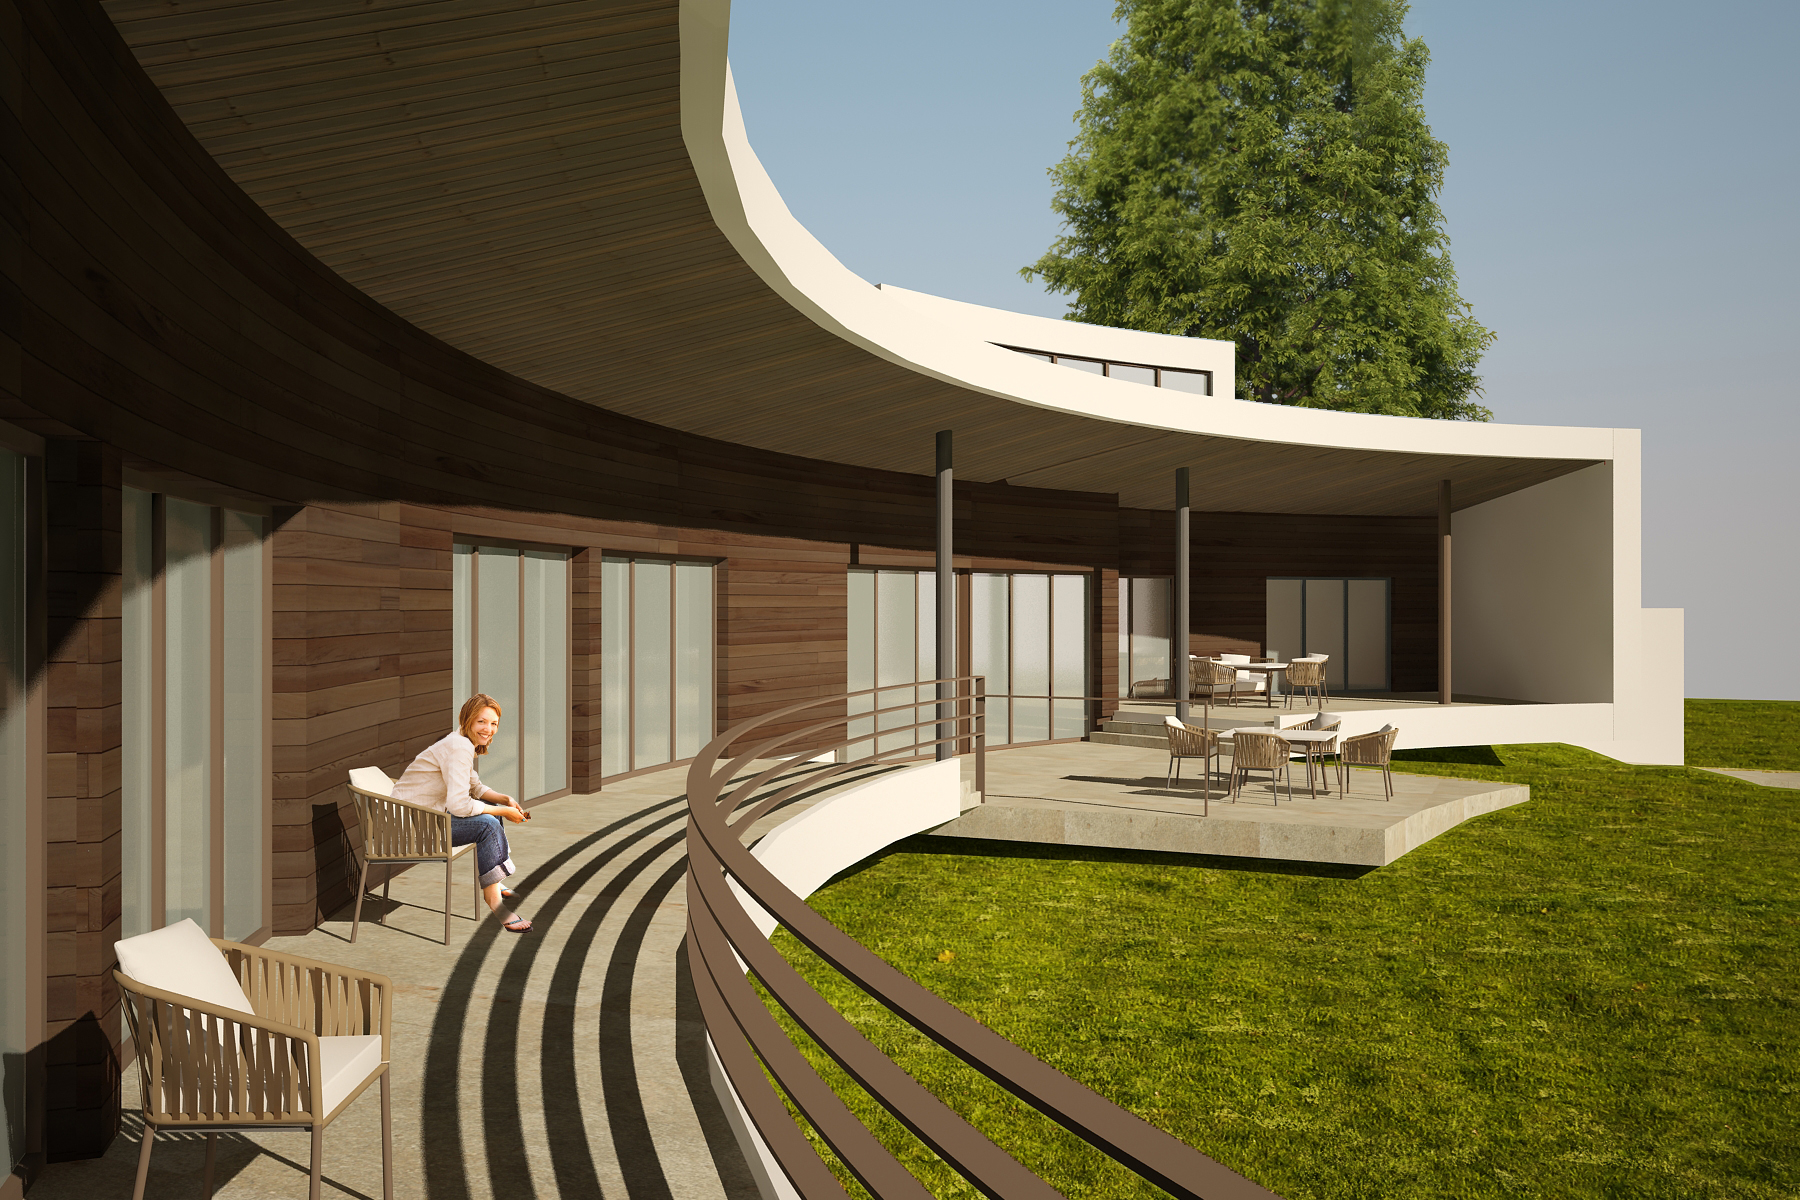 https://nbc-arhitect.ro/wp-content/uploads/2020/10/NBC-Arhitect-_-Breaza-House-_-Breaza-Romania-_-exterior-view_6.jpg